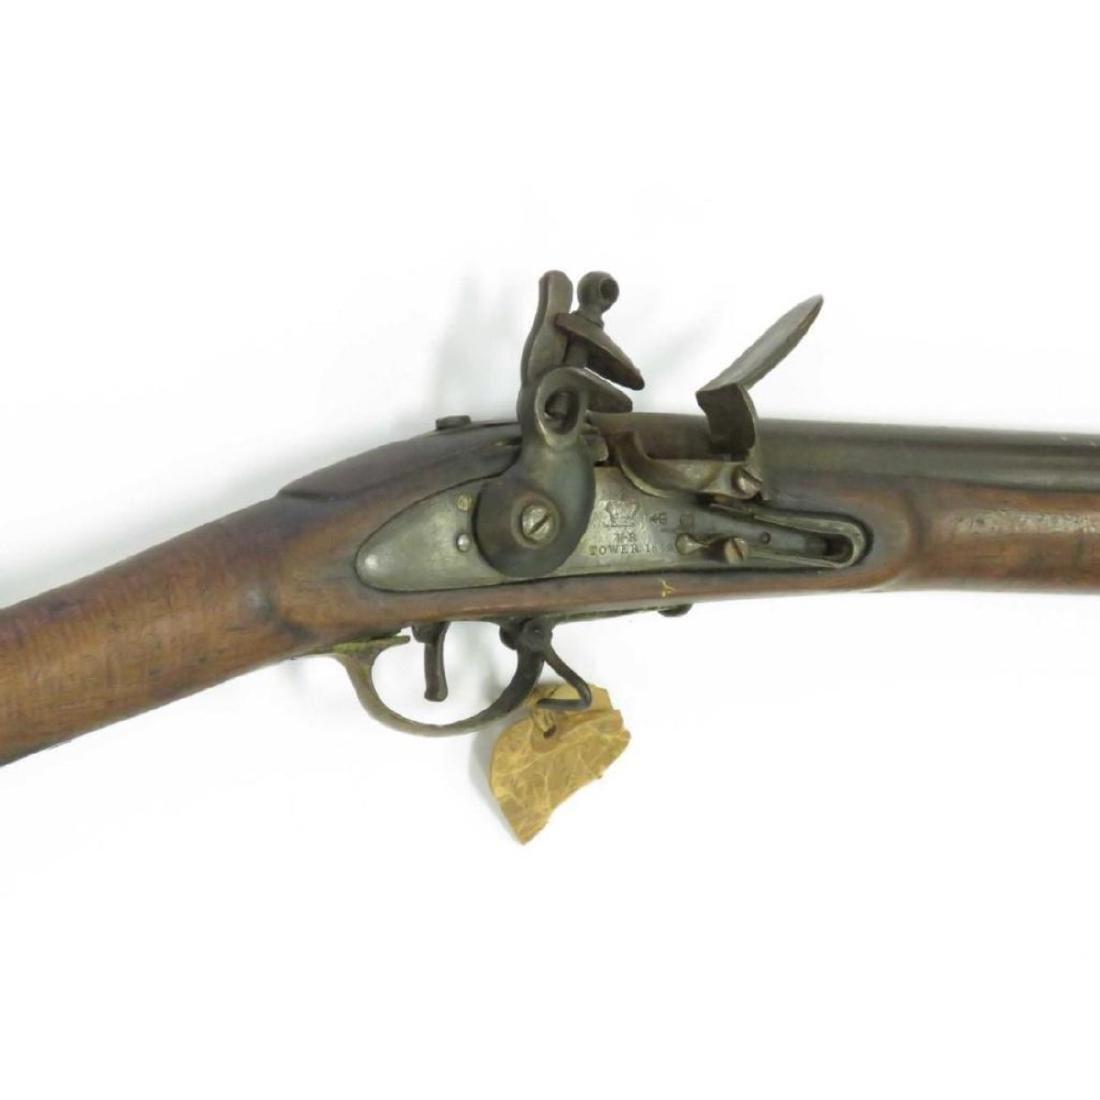 English Tower Pattern 1846 .75 Cal Flintlock Musket - 2